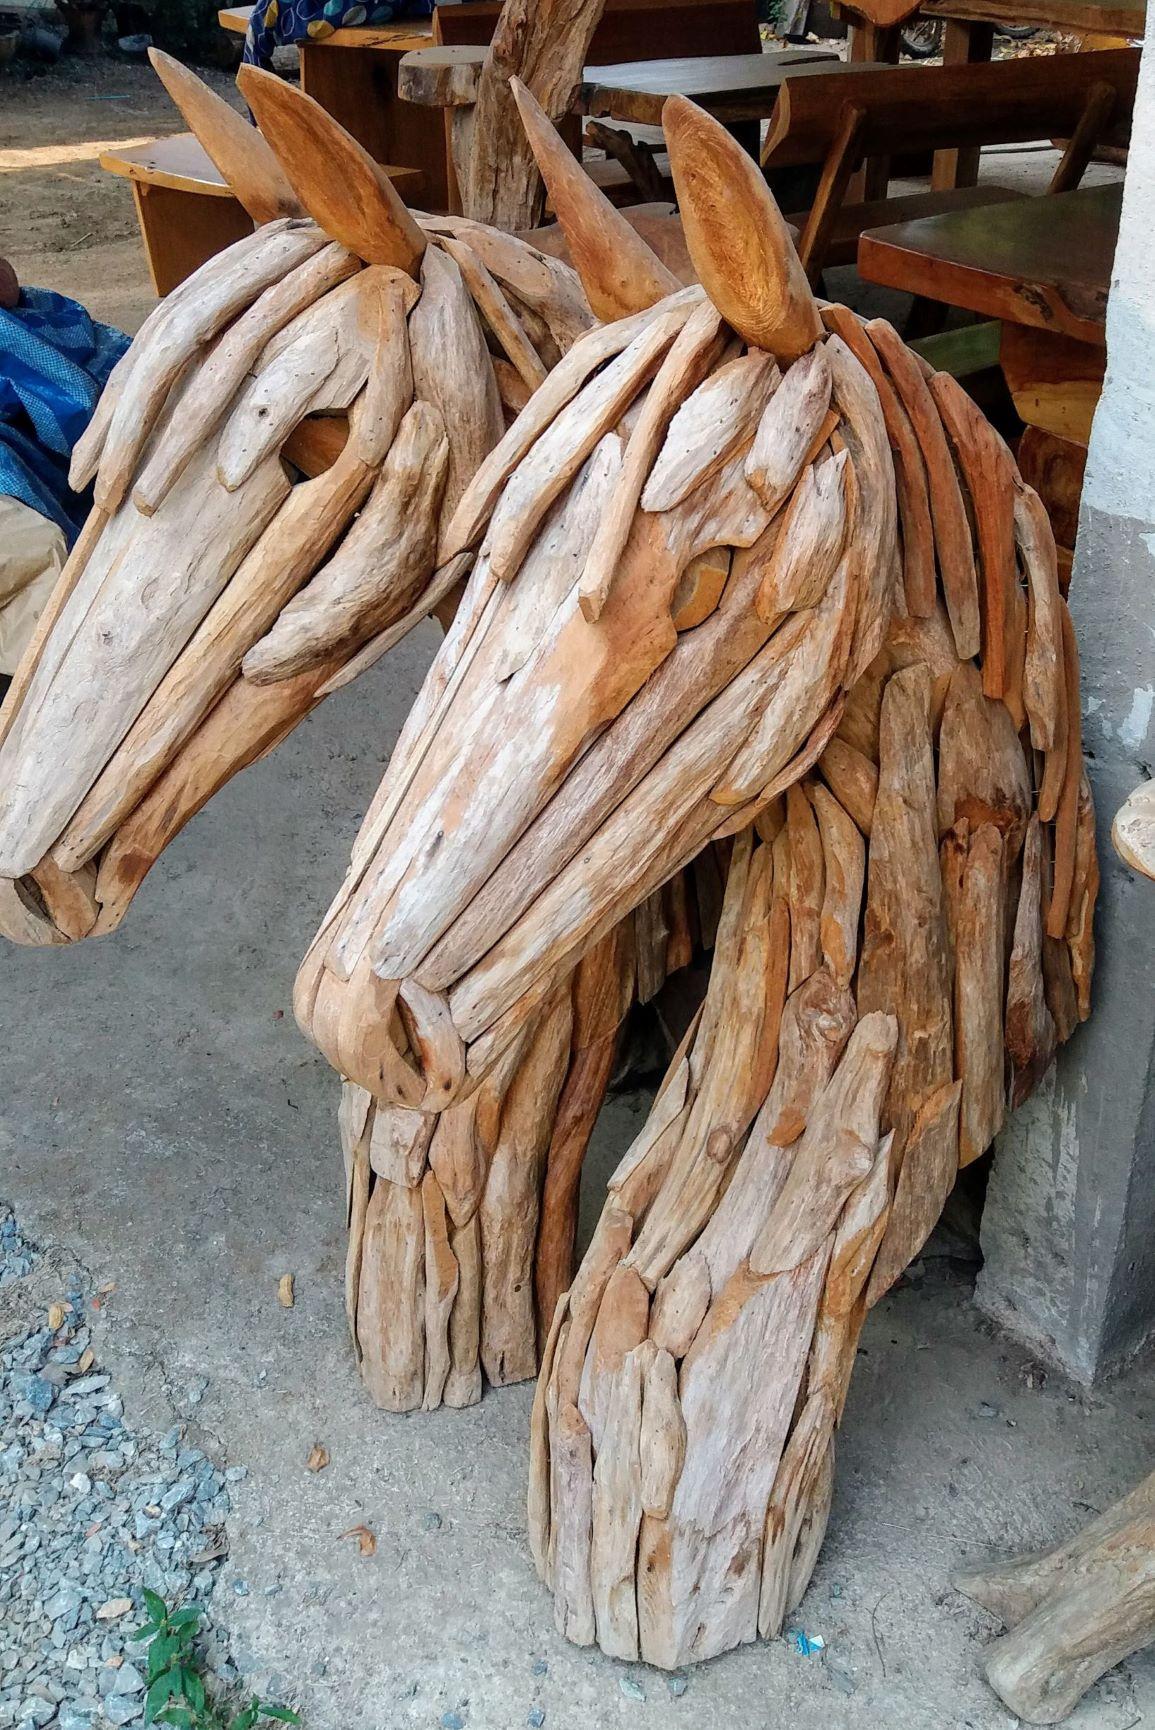 DriftwoodHorse514